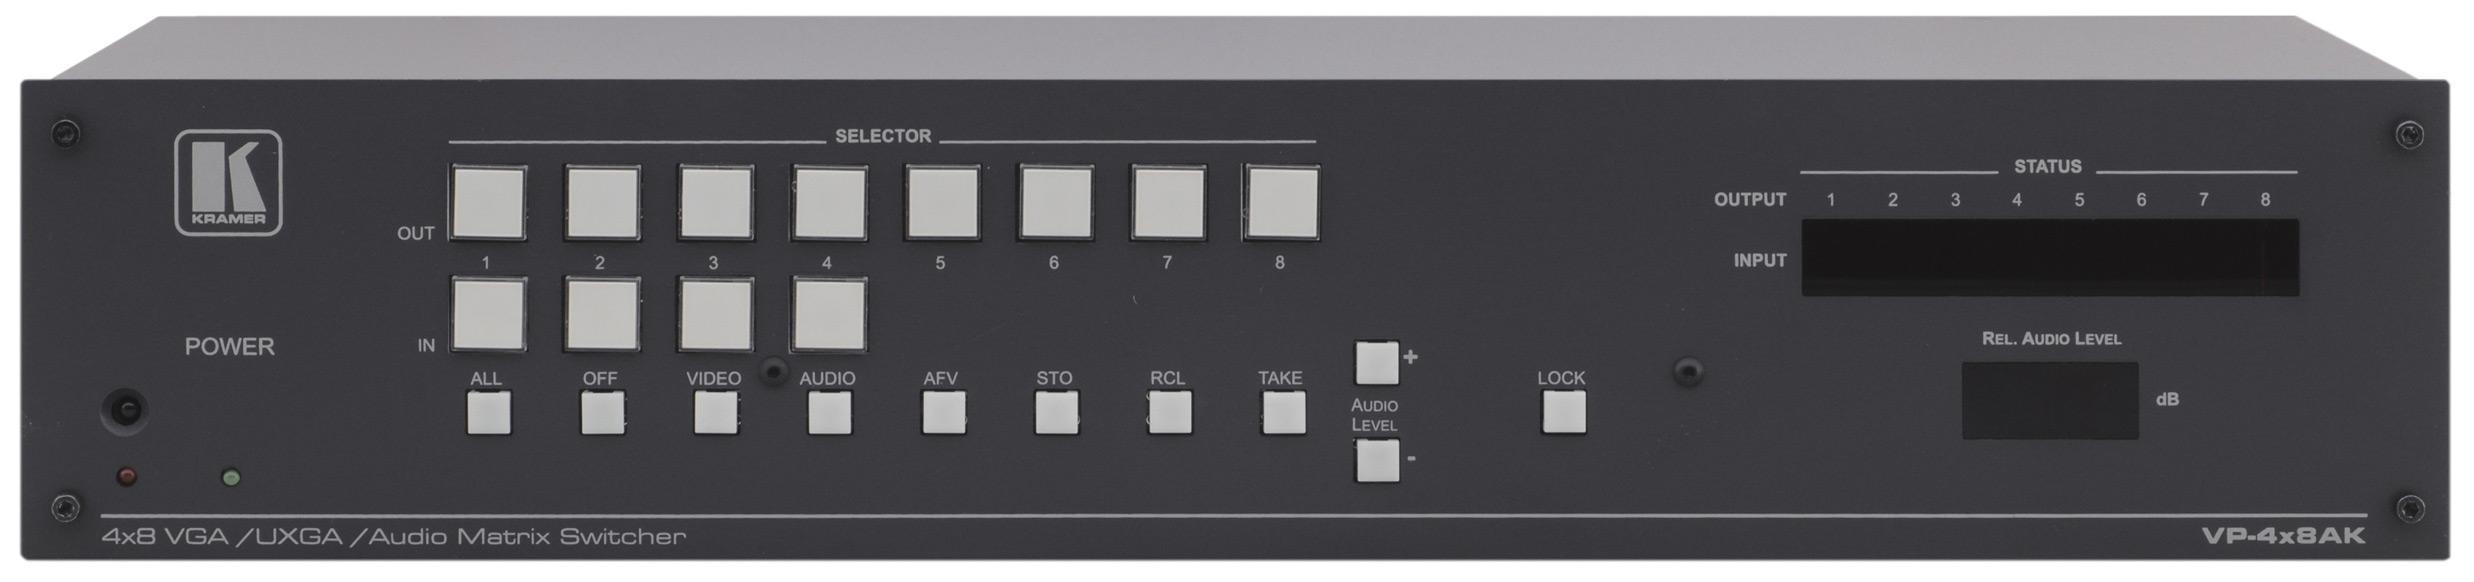 4x8 Computer Graphics Video & Stereo Audio Matrix Switcher